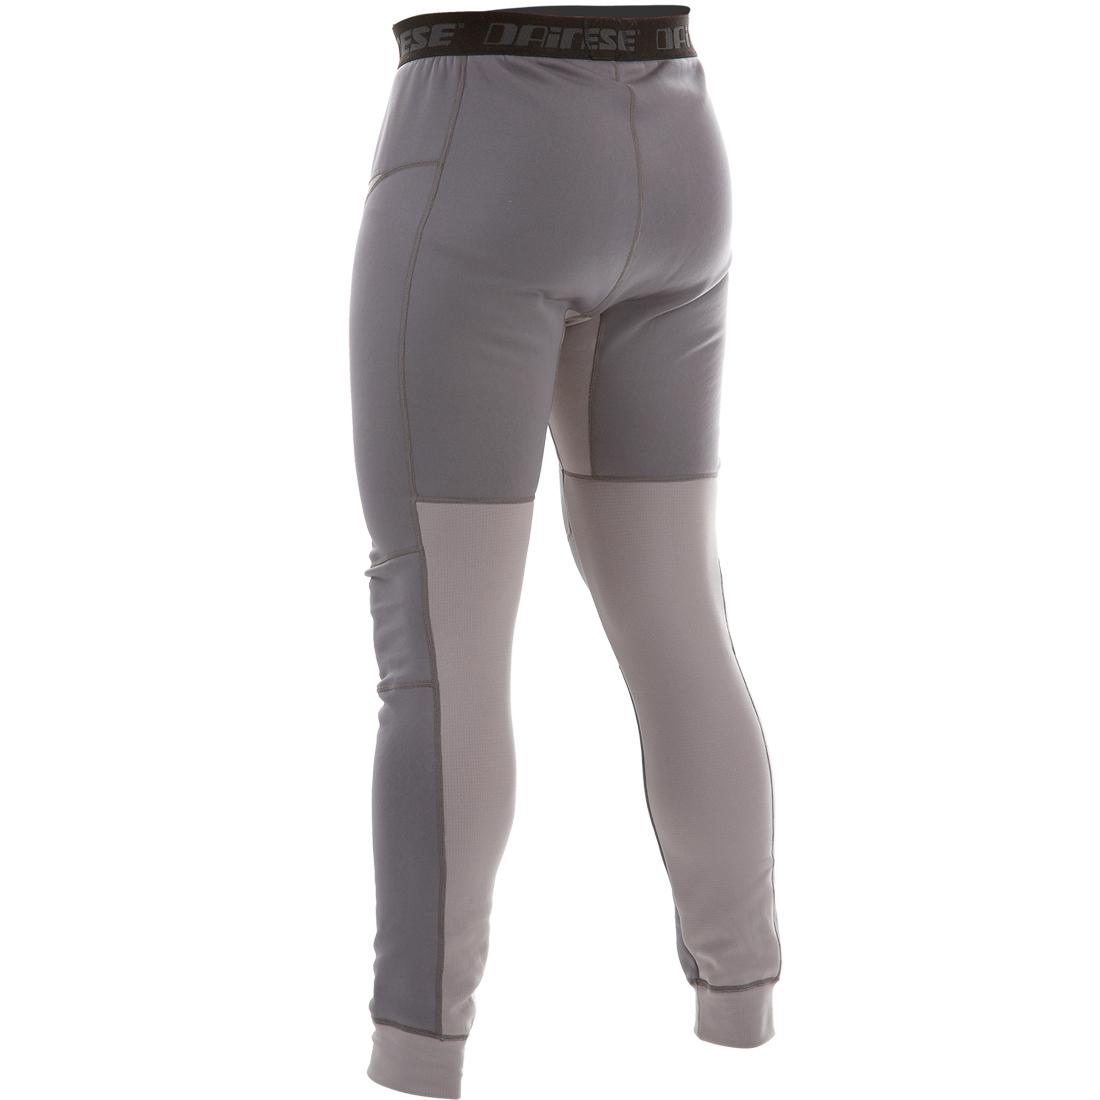 【DAINESE】PANT MAP THERM 保溫內層褲 - 「Webike-摩托百貨」